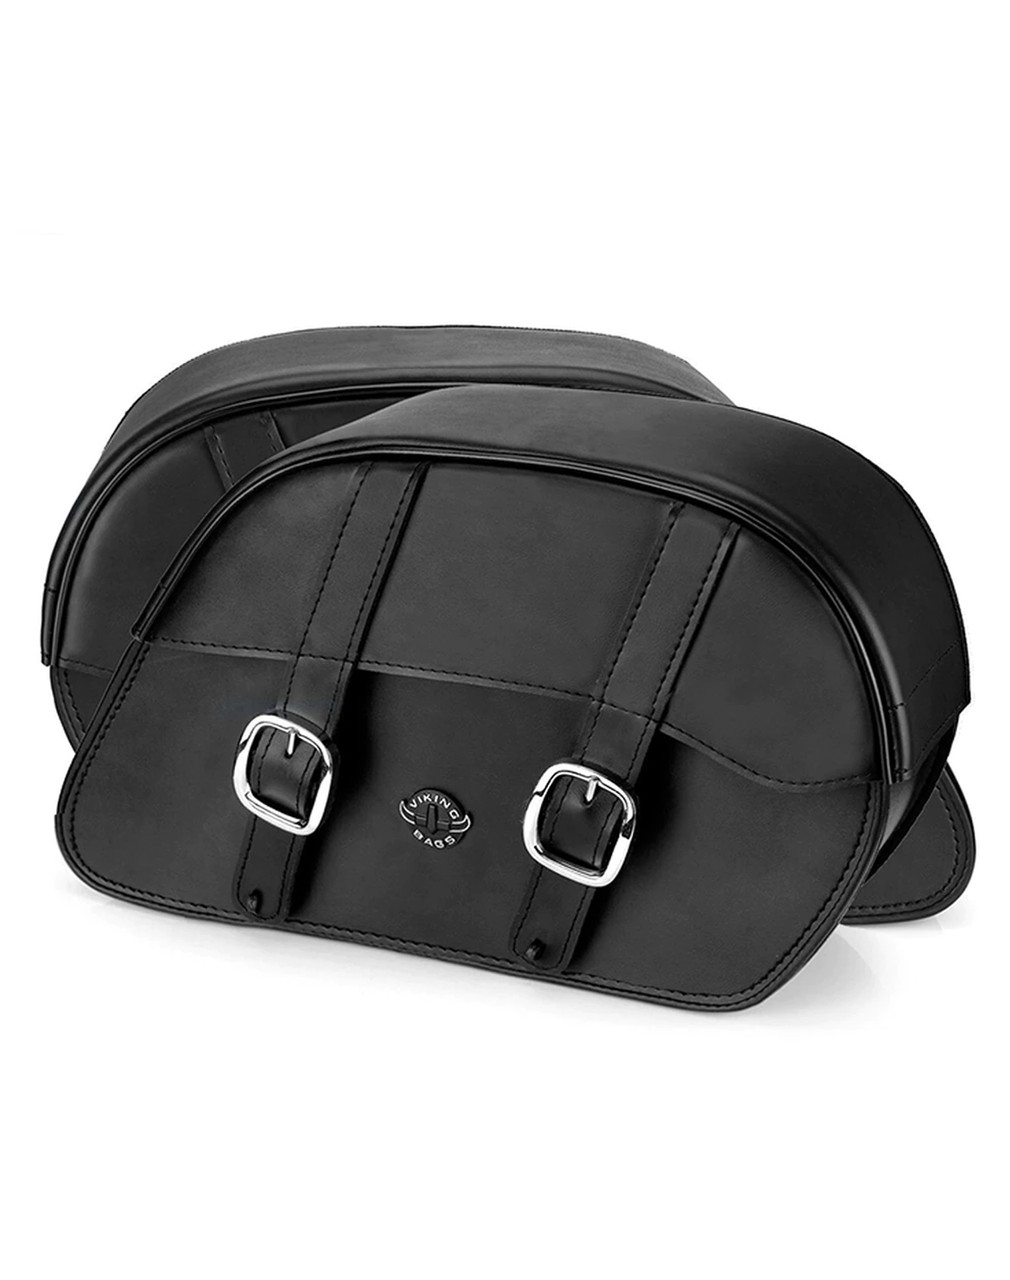 Honda VTX 1800 N Slanted L Motorcycle Saddlebags Both Bags View